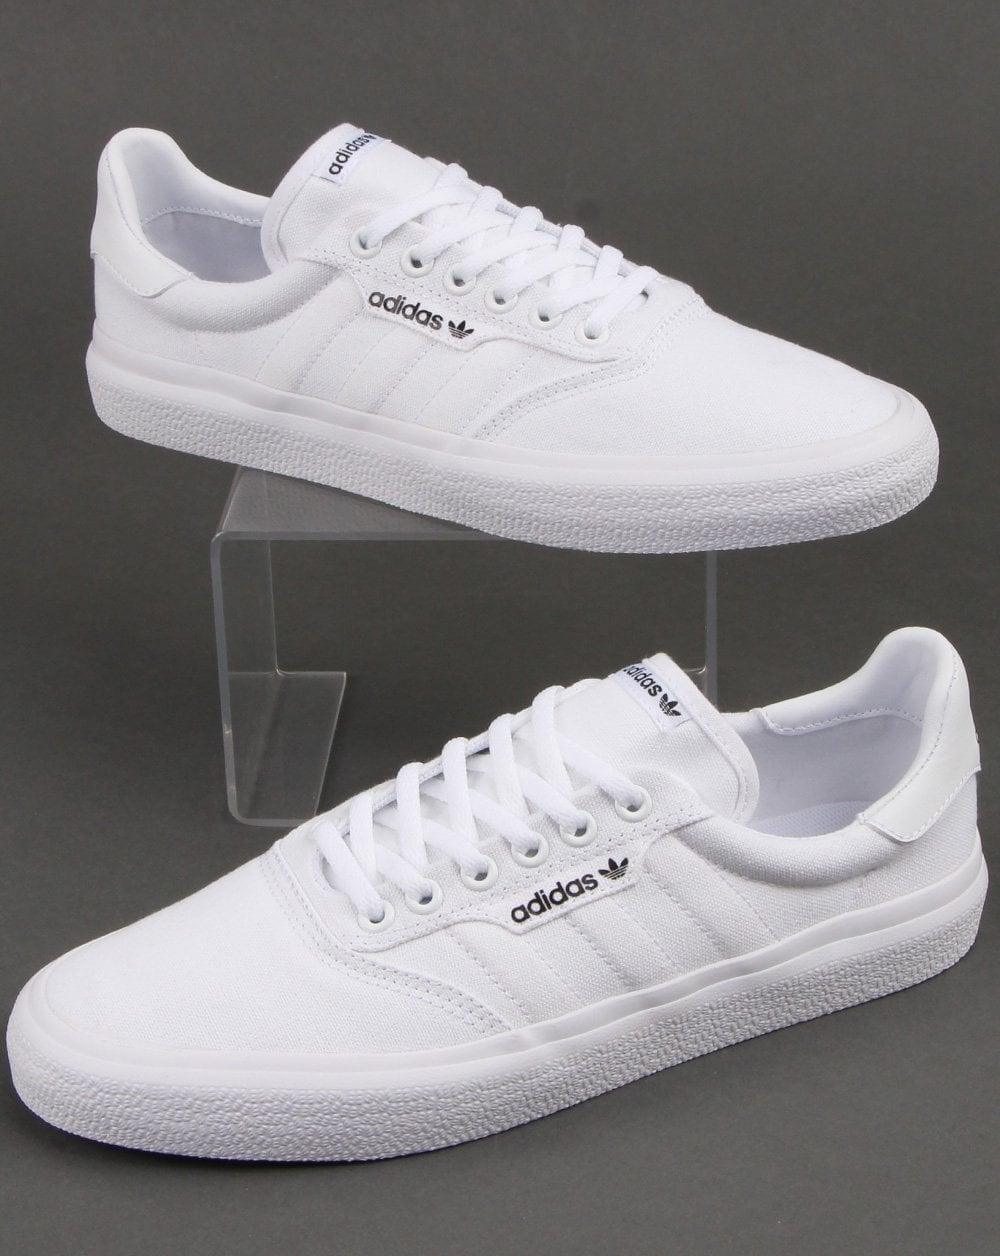 Adidas Originals - ADC Fashion Crew | White adidas